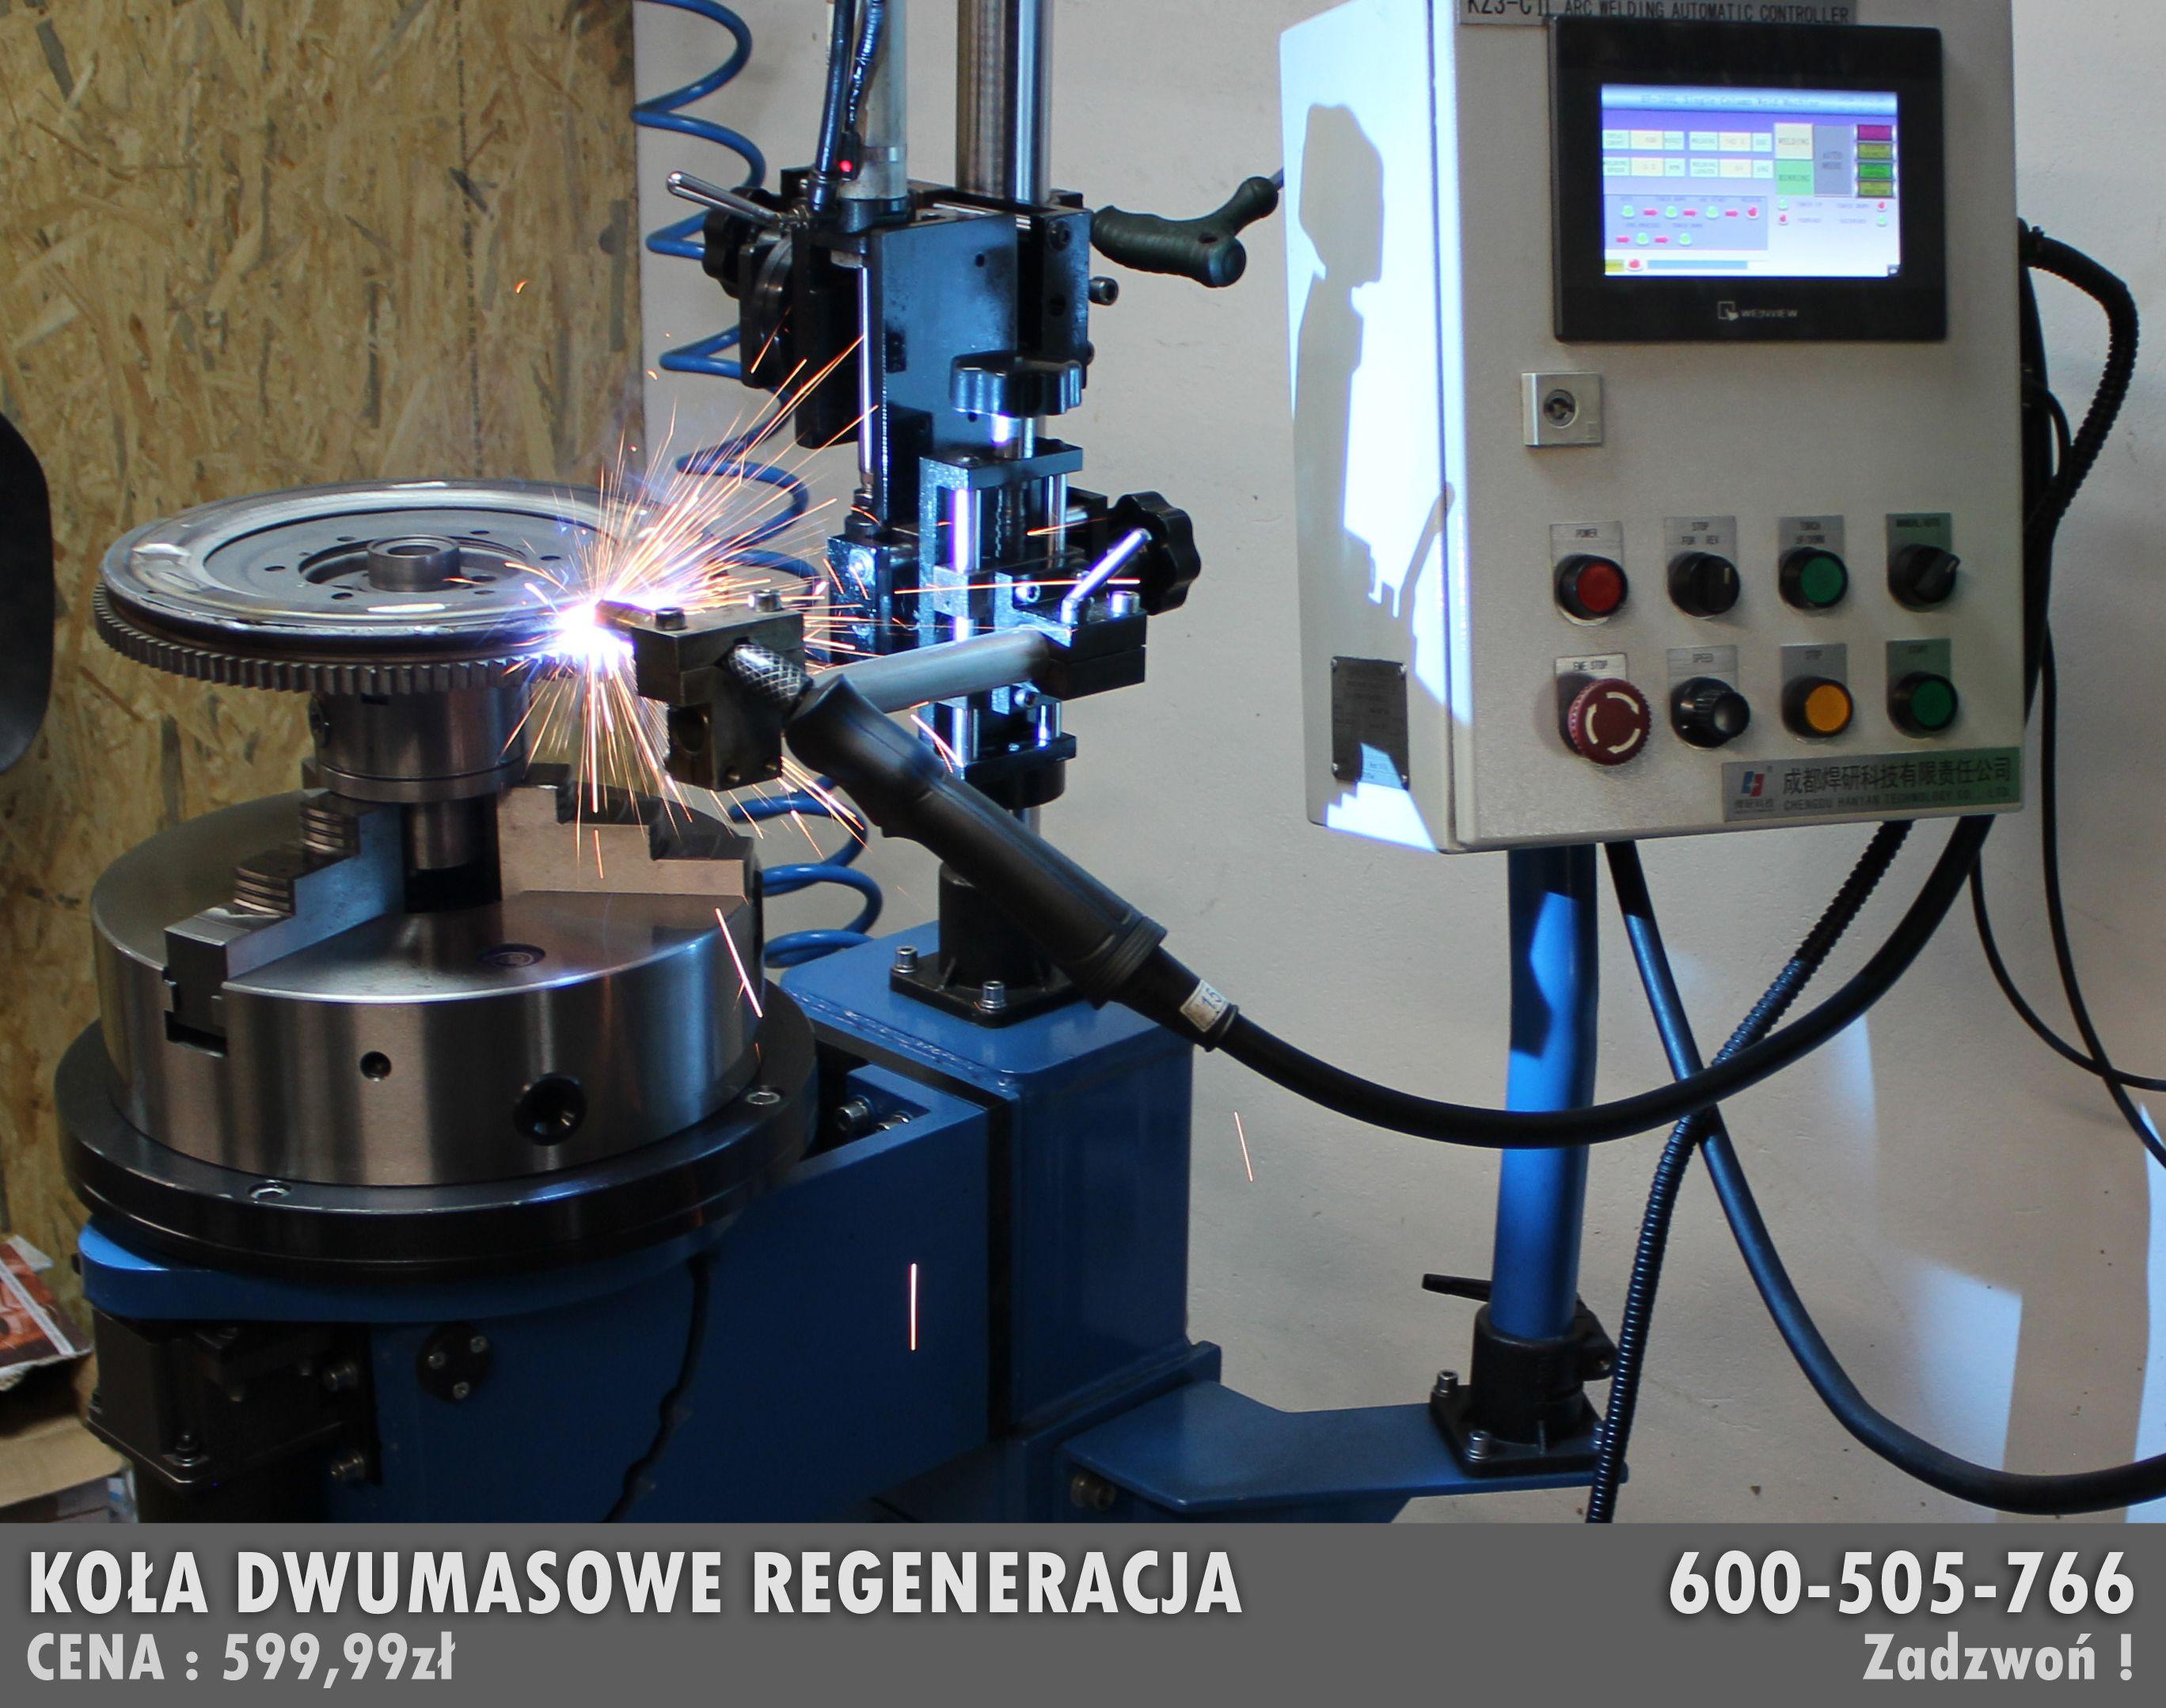 Profesjonalna Regeneracja Kol Dwumasowych Takze Na Allegro Kitchen Appliances Home Appliances Vacuum